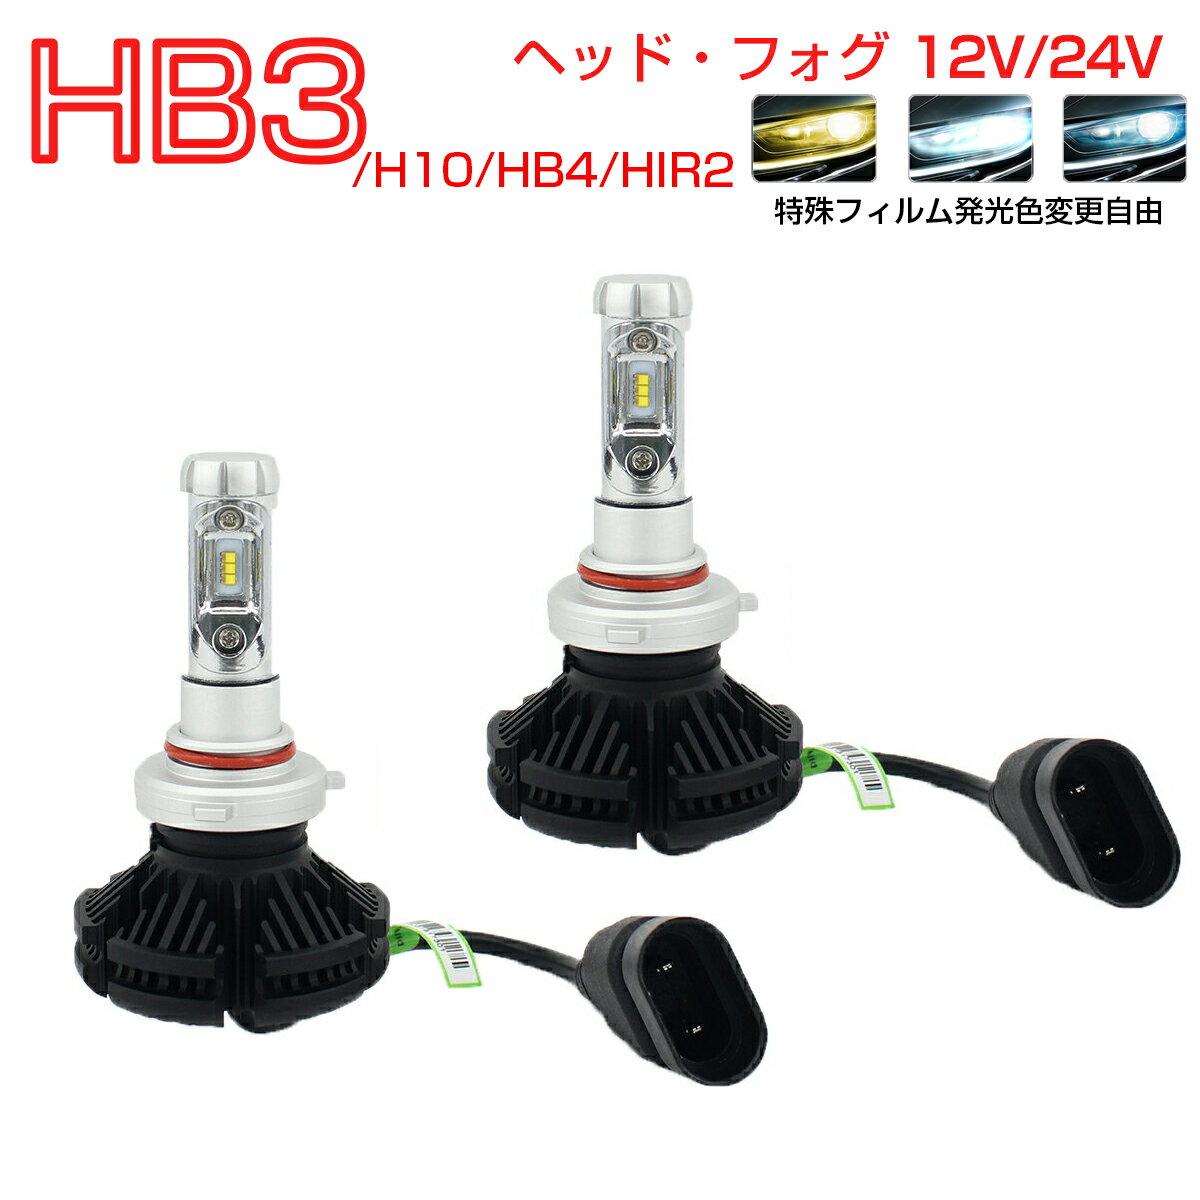 TOYOTA RAV4(minor前) H17.11〜H20.8 ACA3# リアスペアタイヤ付 ヘッドライト(HI)[HB3]白色 LED HB3 2個入り LEDヘッドライト 6000LM 激安品要注意!PHILIPS 12V 24V 6500K 宅配便送料無料 6ヶ月保証 K&M